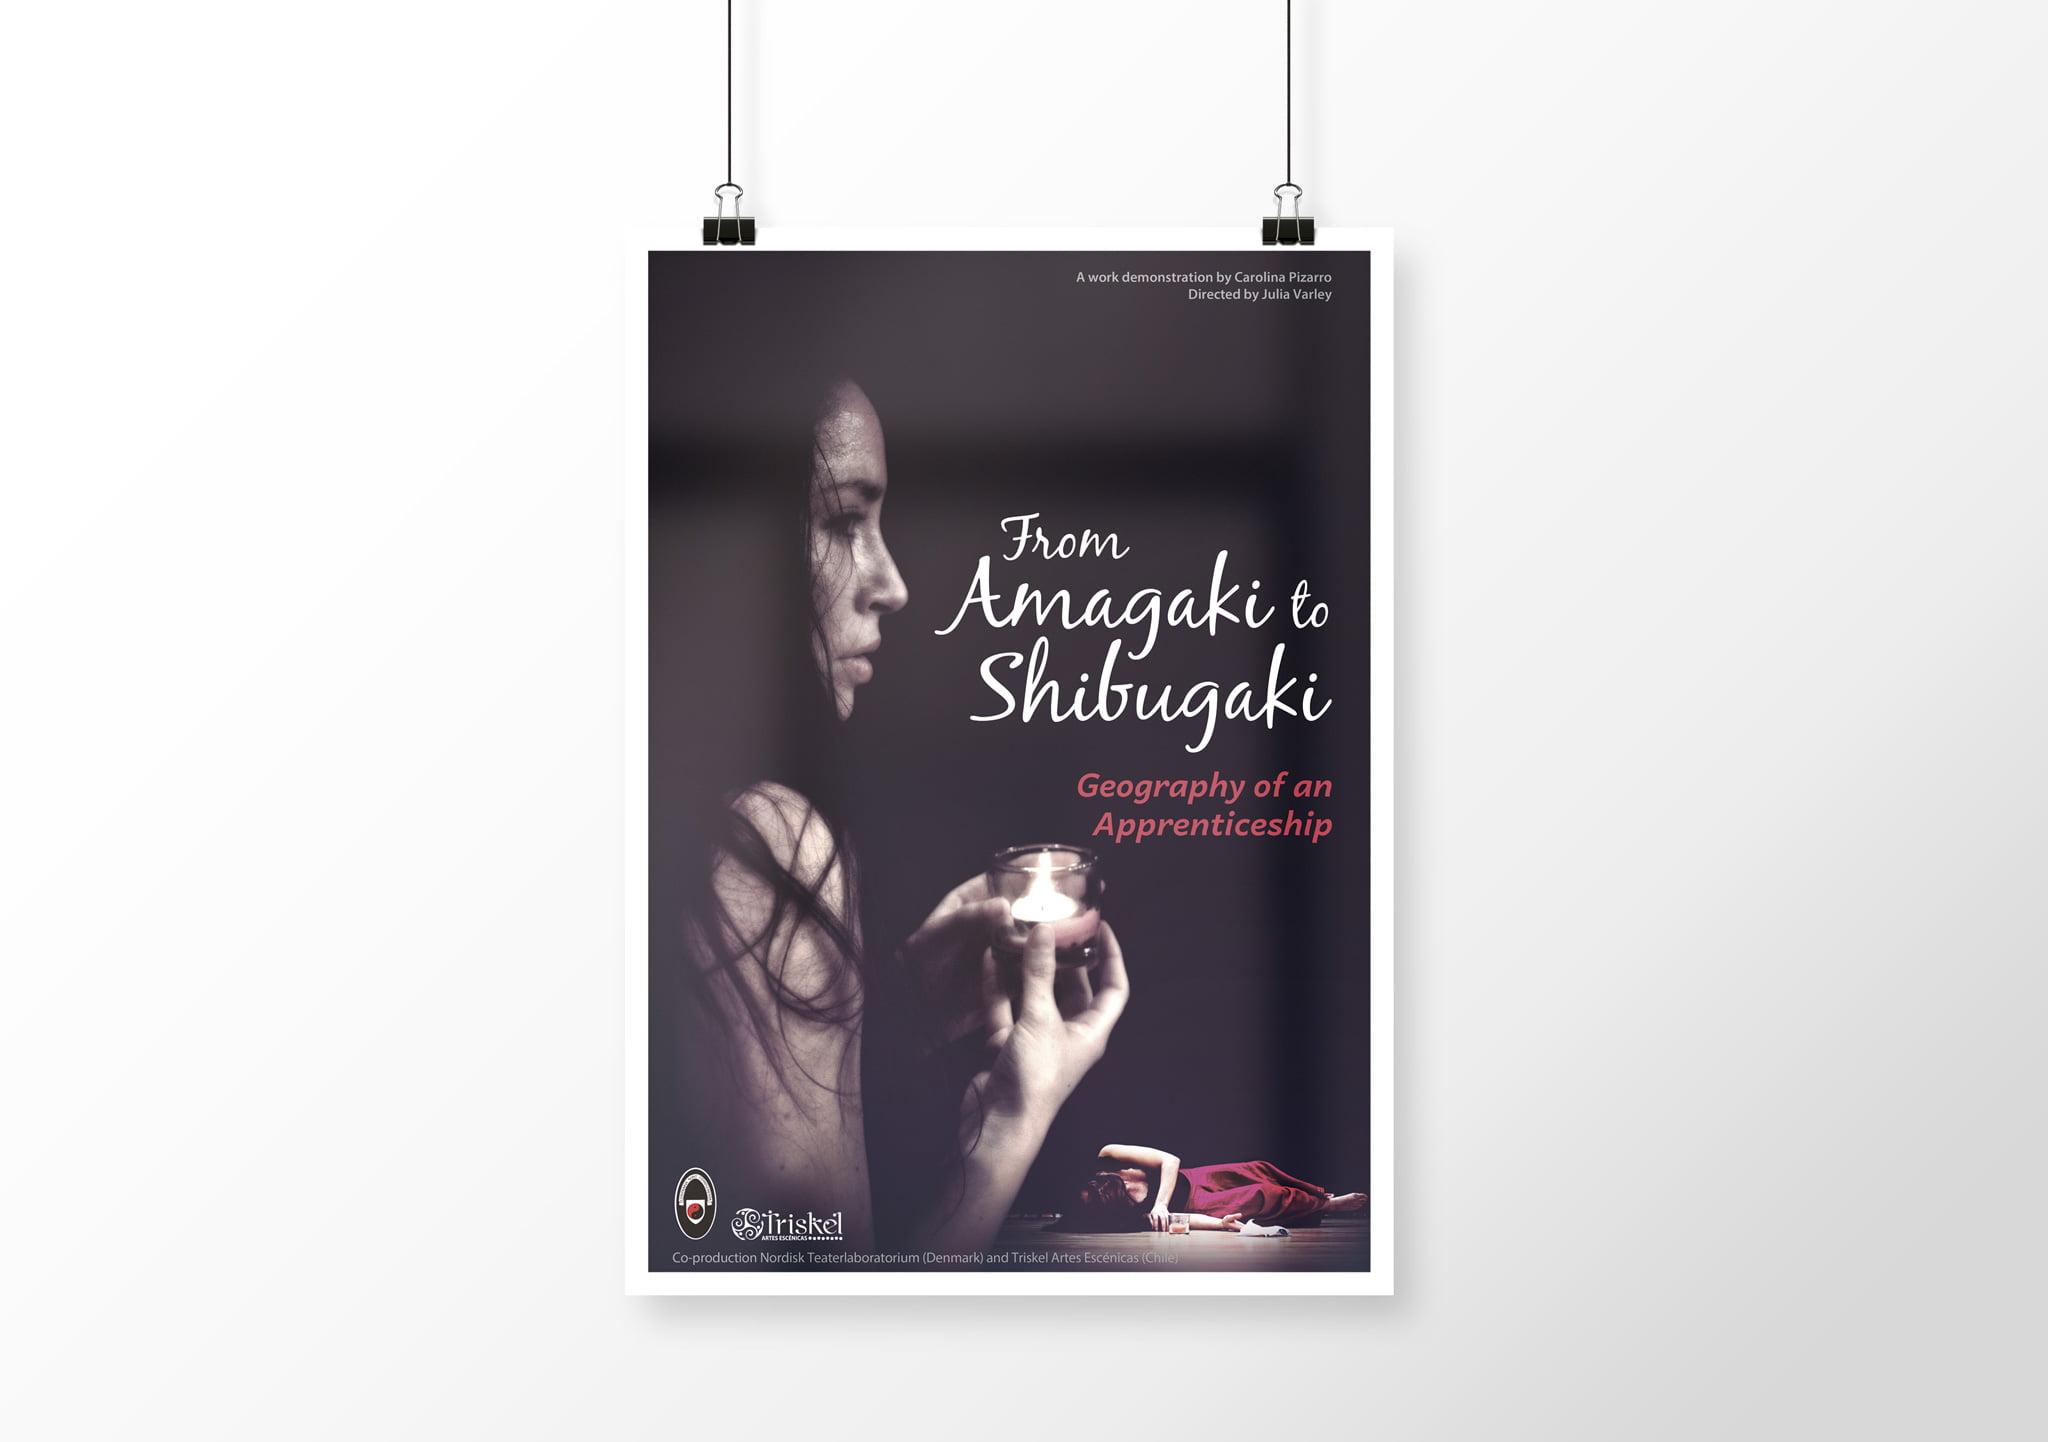 afiche carolina pizarro - Portafolio